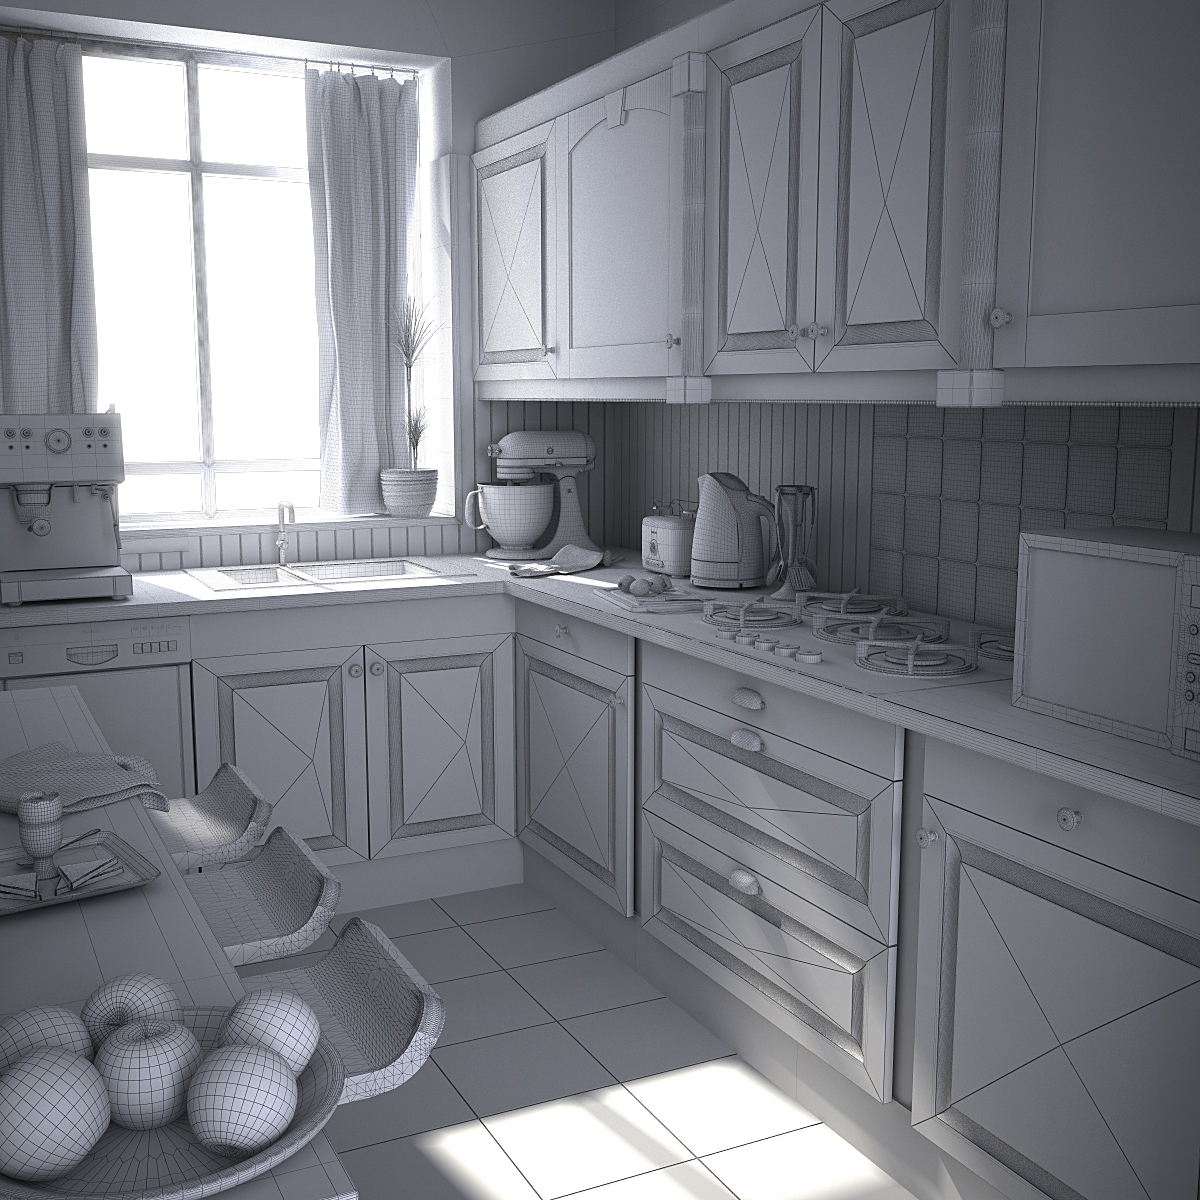 Wireframe render of kitchen model